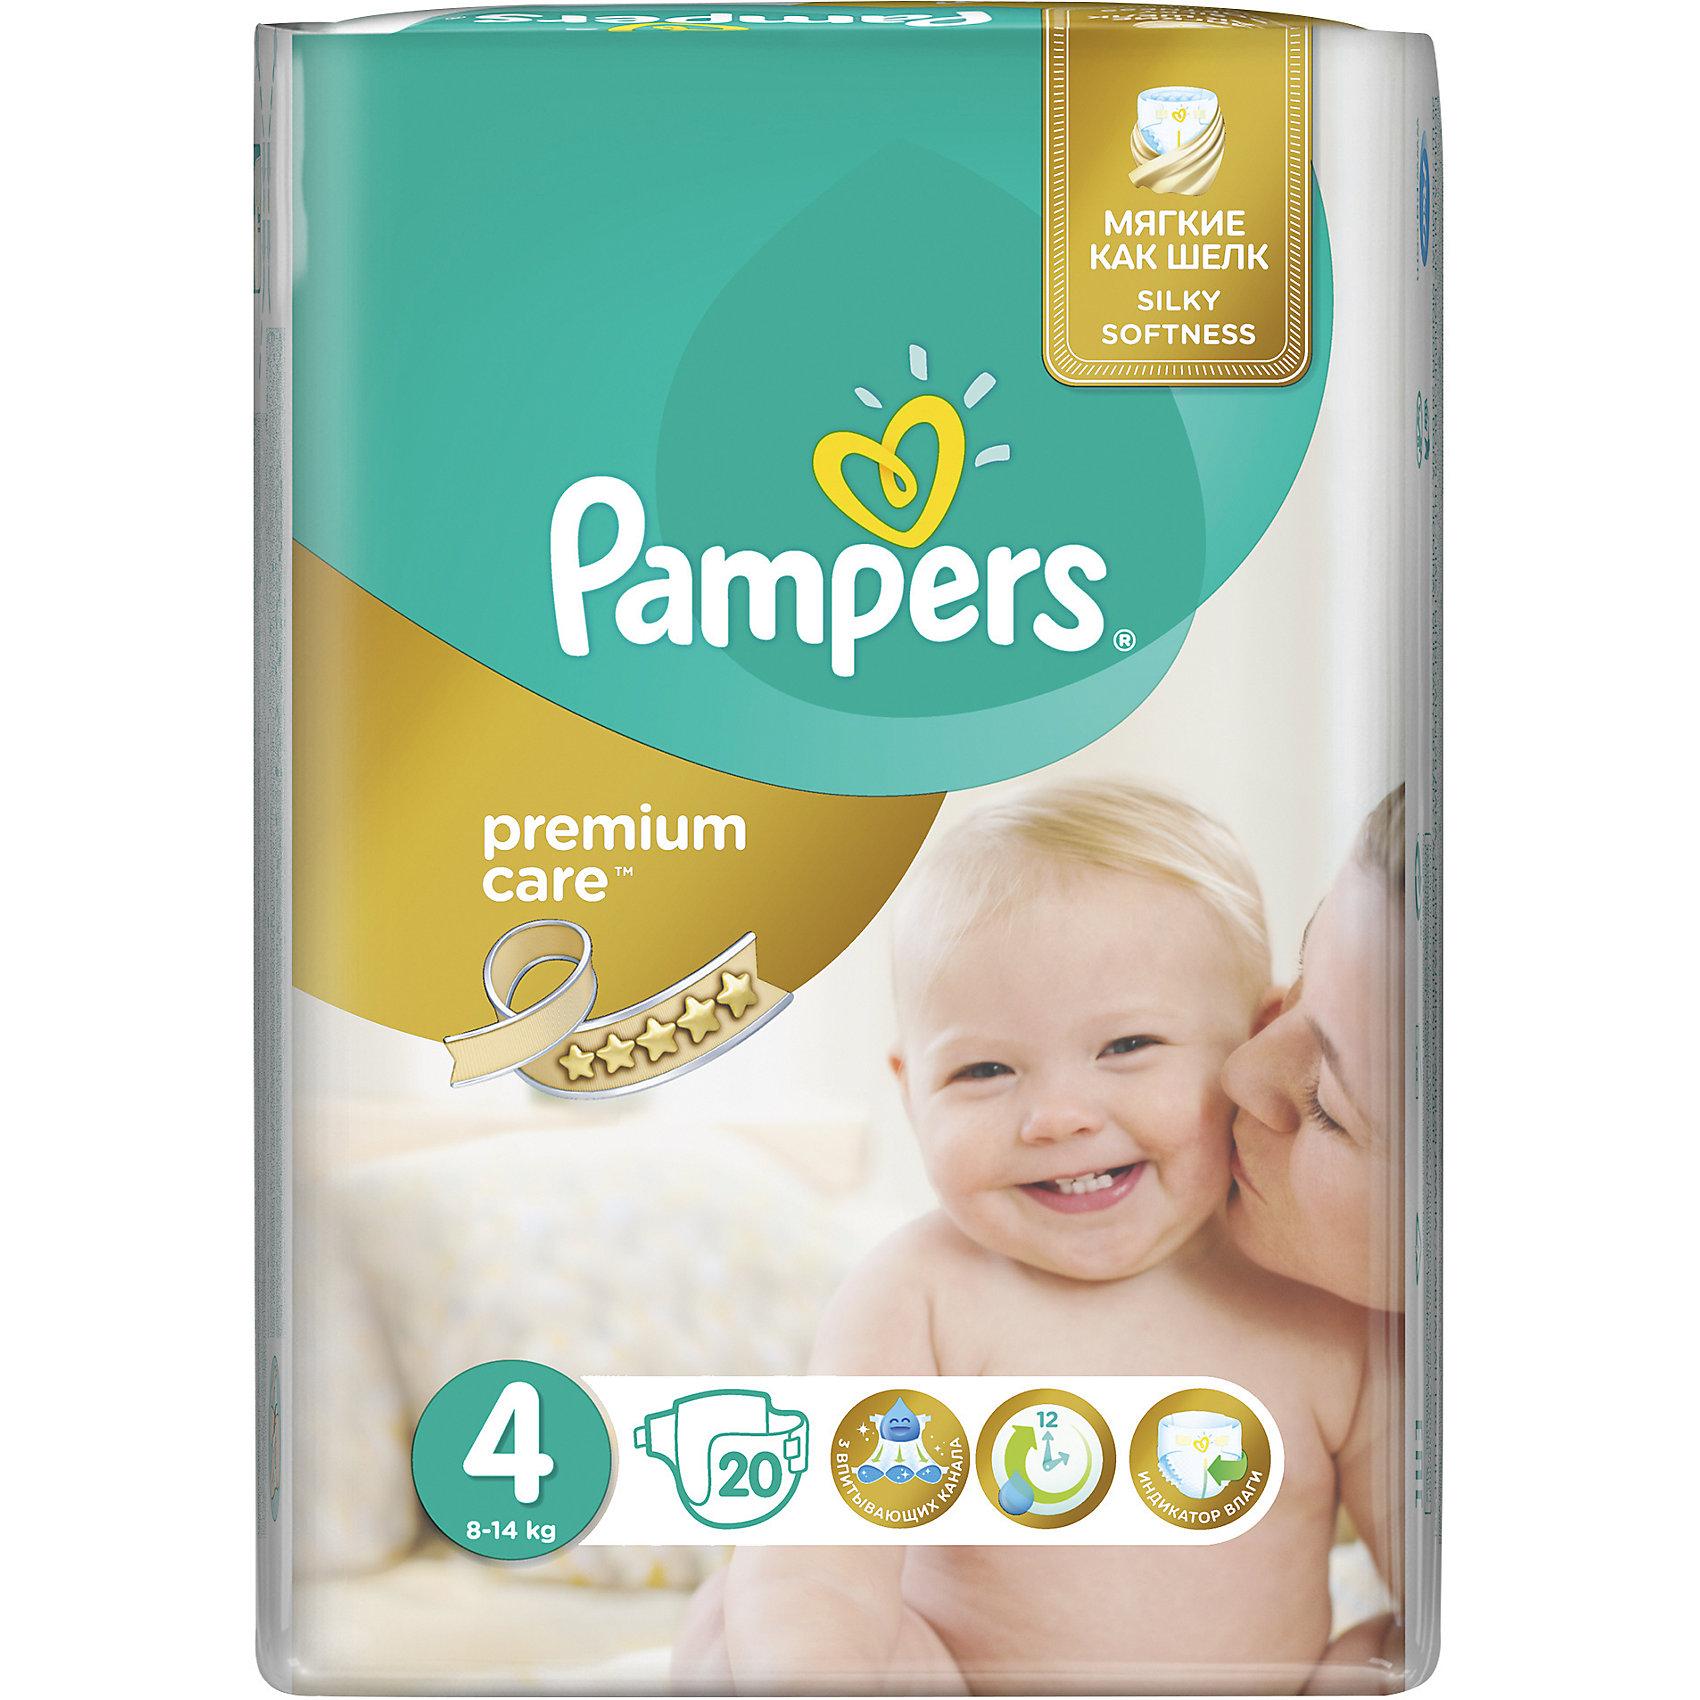 Подгузники Pampers Premium Care, Maxi, 8-14 кг, 4 размер, 20 шт., Micro pack, PampersПодгузники более 12 кг.<br><br><br>Ширина мм: 178<br>Глубина мм: 115<br>Высота мм: 218<br>Вес г: 595<br>Возраст от месяцев: 12<br>Возраст до месяцев: 24<br>Пол: Унисекс<br>Возраст: Детский<br>SKU: 5516312